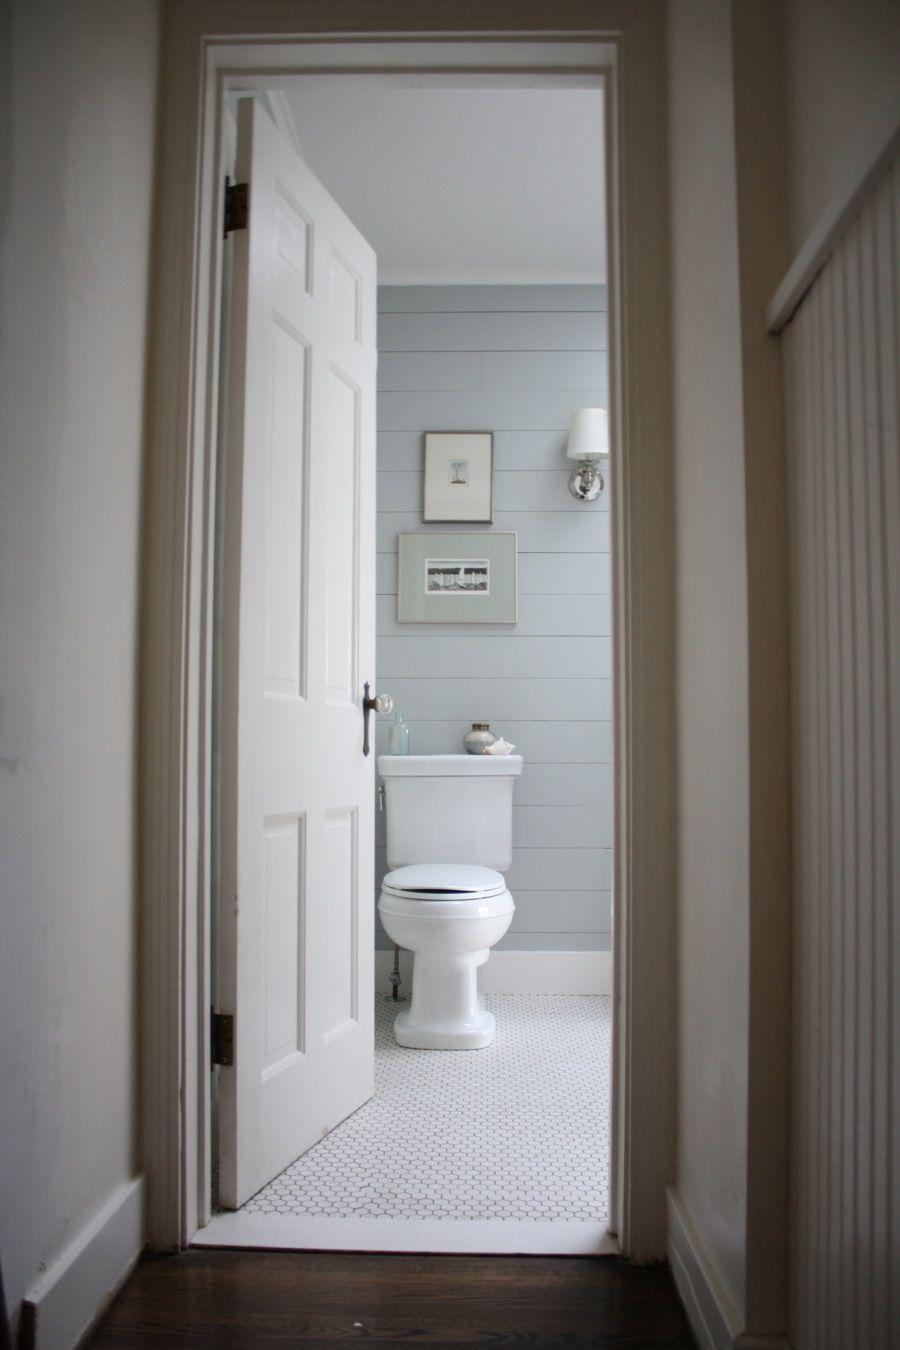 Bathroom Tiles Horizontal horizontal shiplap and white hex tiles = cottage bathroom